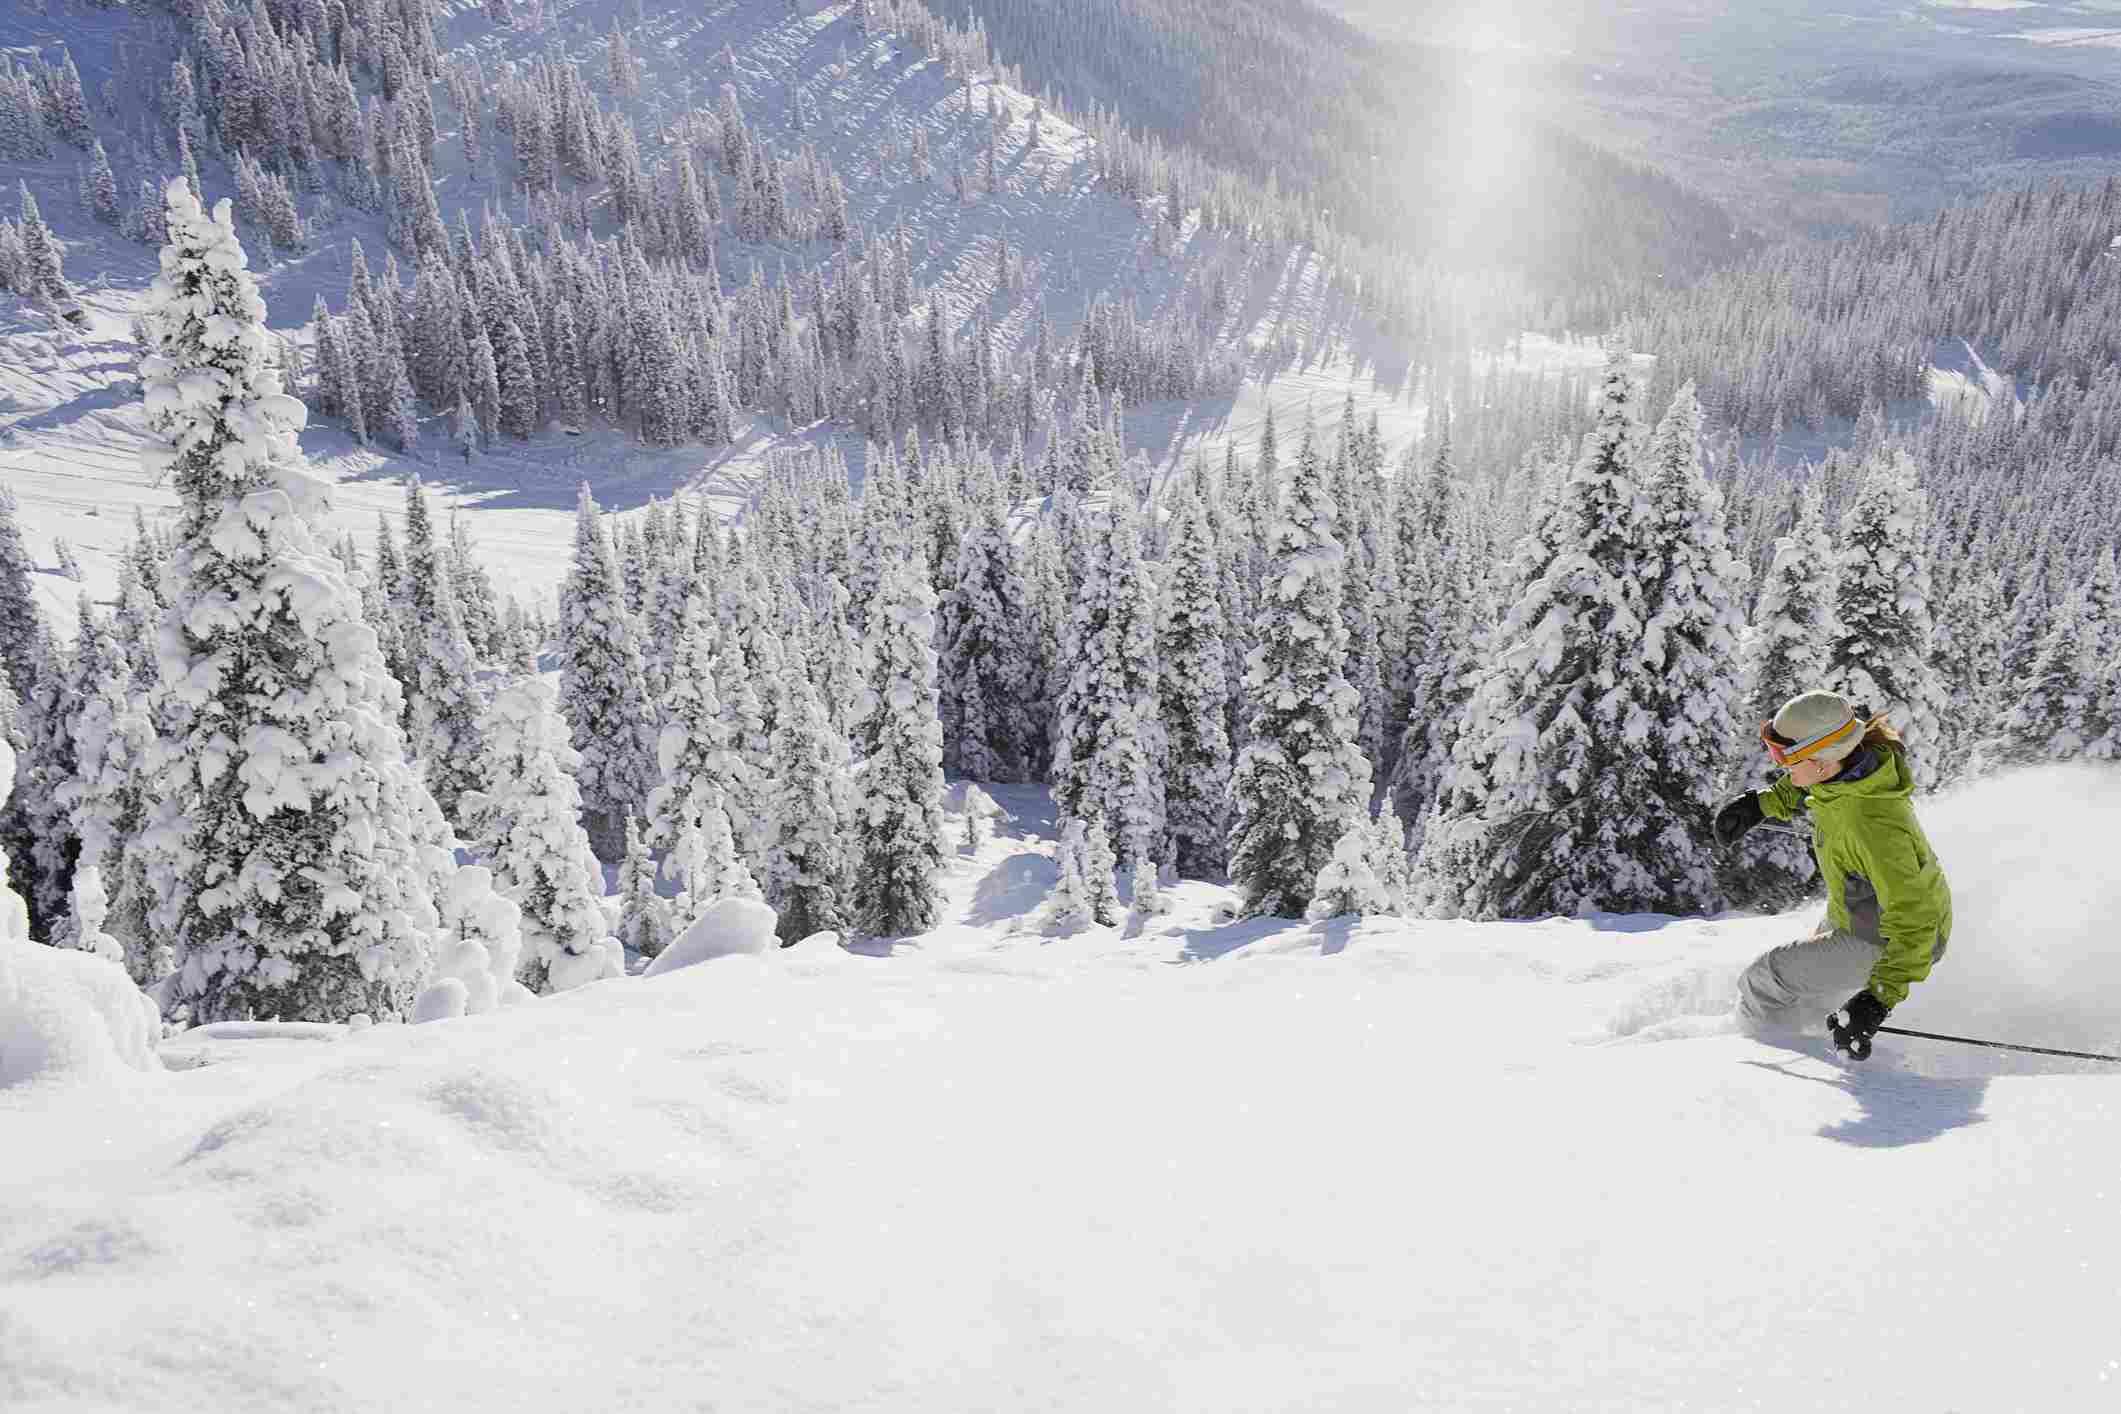 Montana, Whitefish, skier on slope